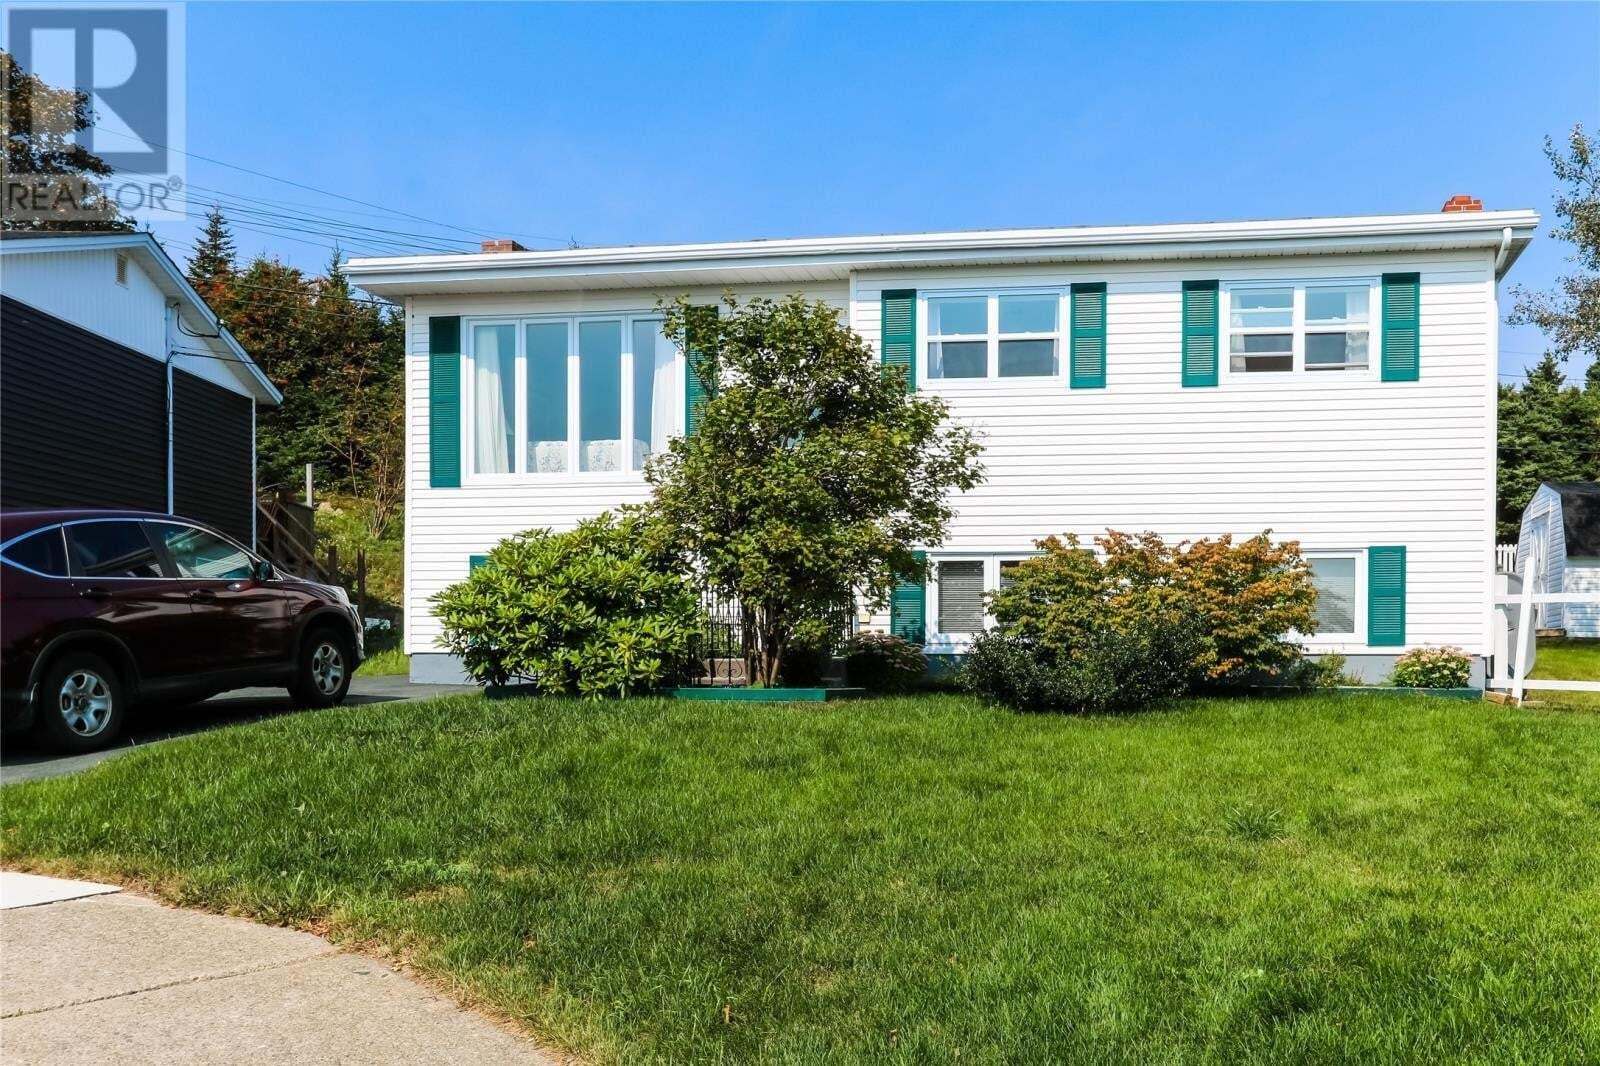 House for sale at 14 Collins Pl St. John's Newfoundland - MLS: 1221196